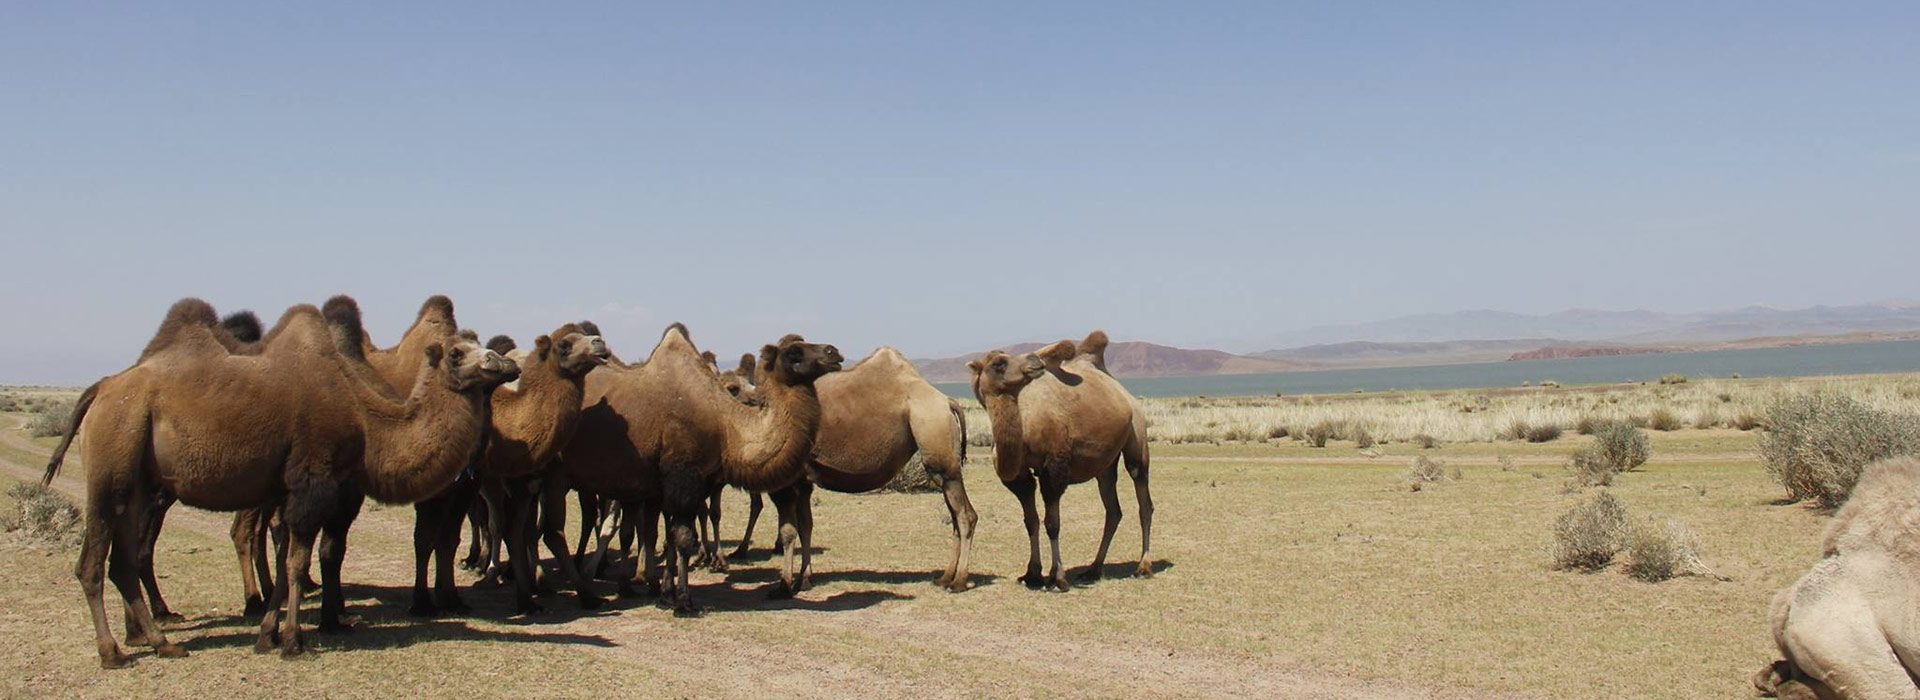 camels-lake-in-gobi